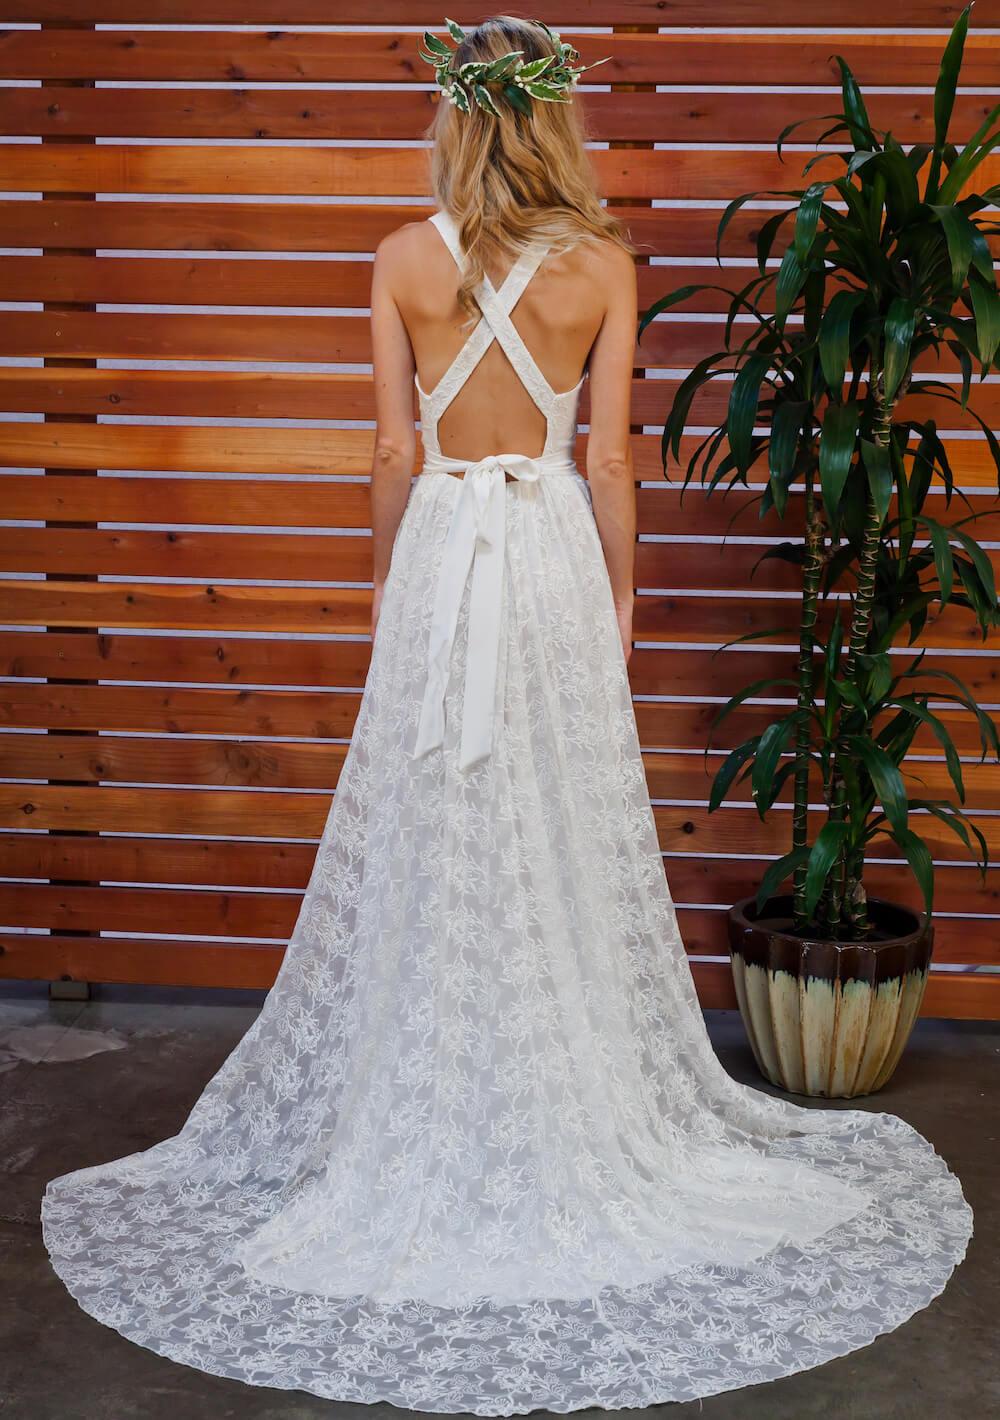 oprn-back-silk-embroidery-bohemian-romantic-wedding-gown